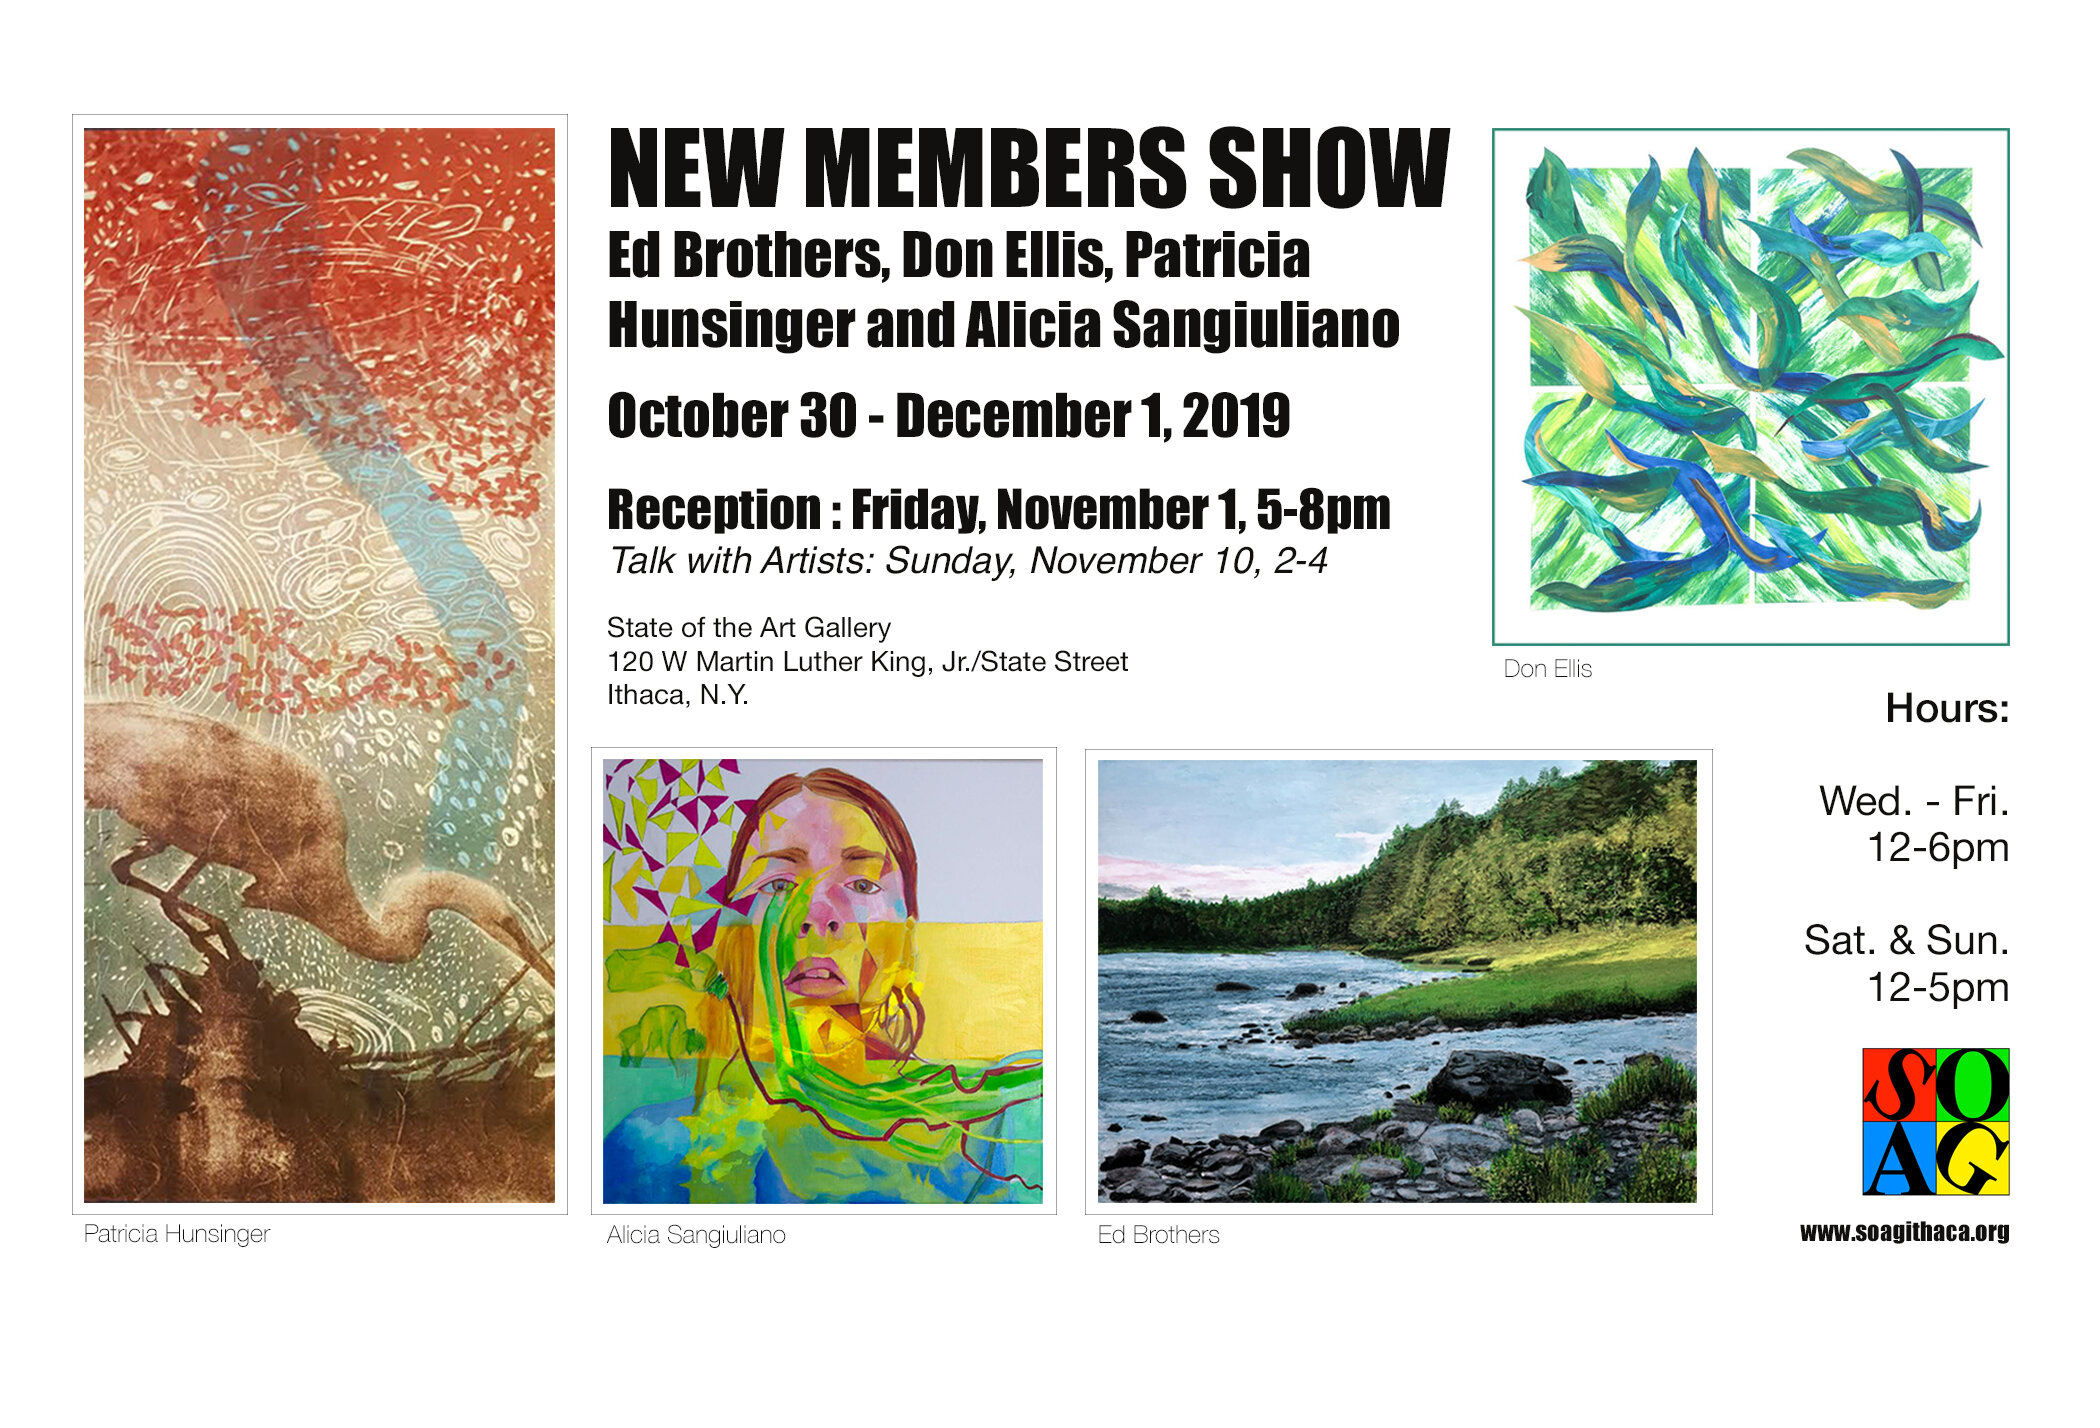 ARTIST TALK: Rivers of Change    Sunday November 10 from 2:00 until 4:00